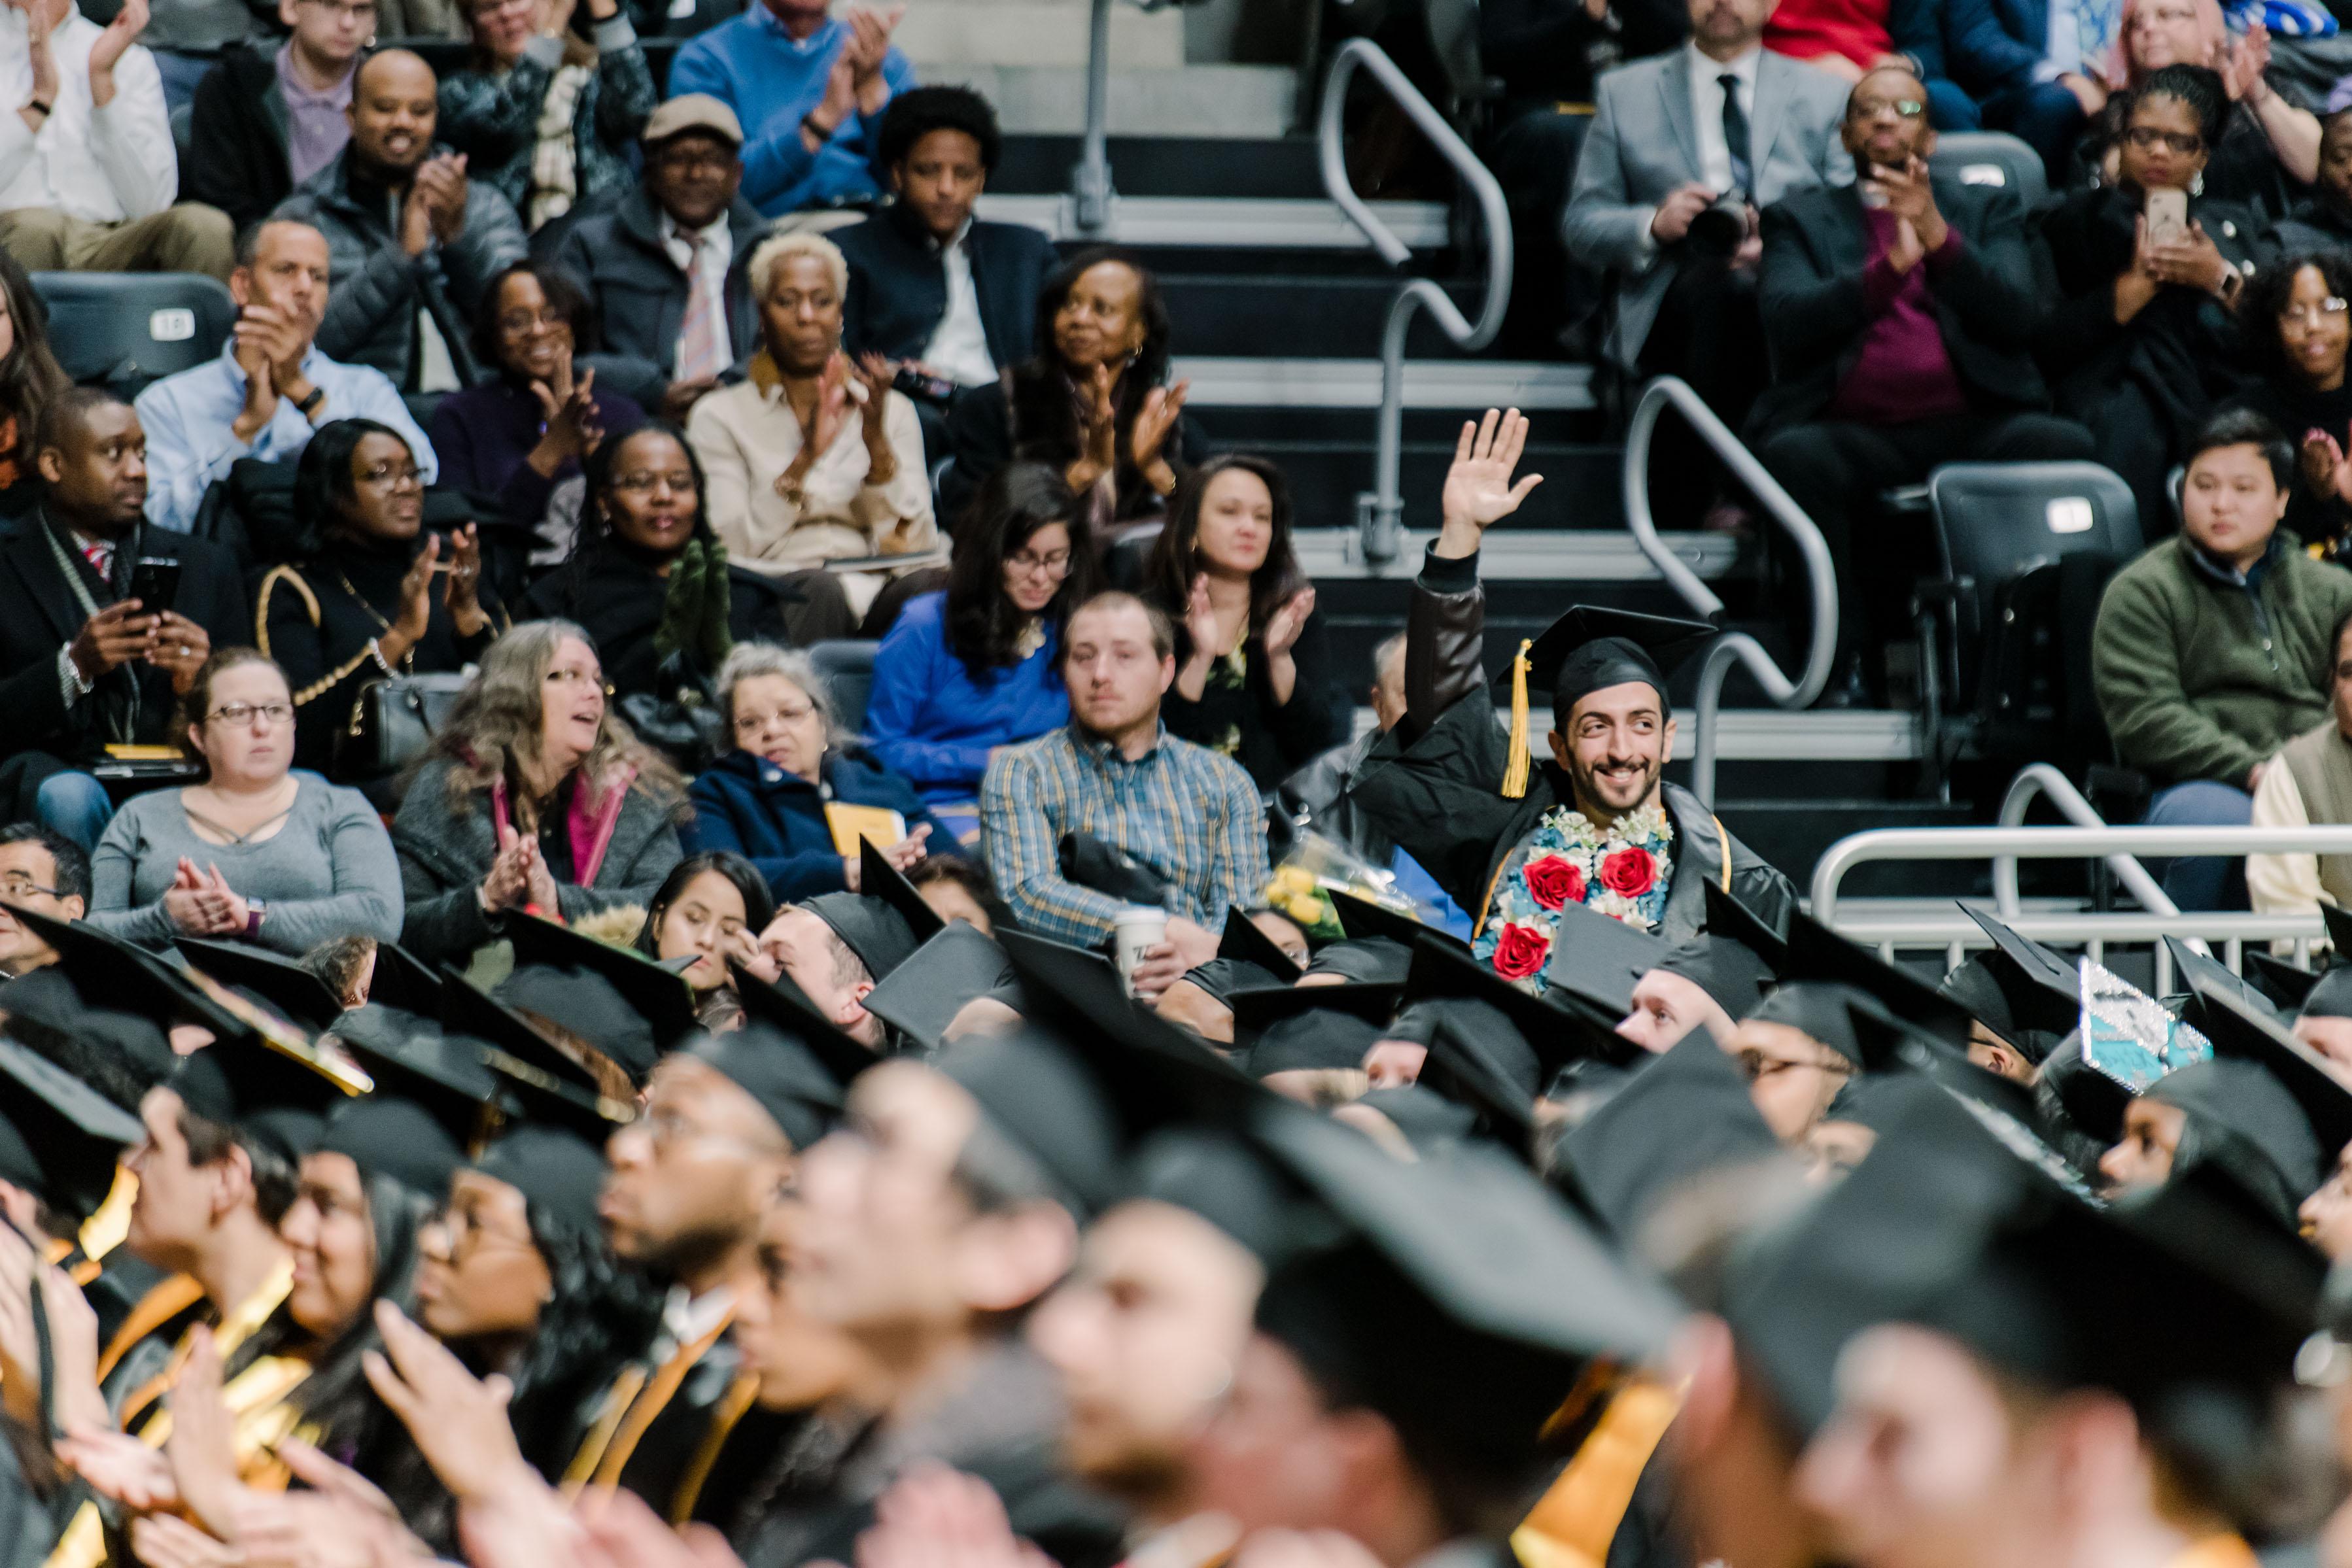 graduating man waves as crowd claps